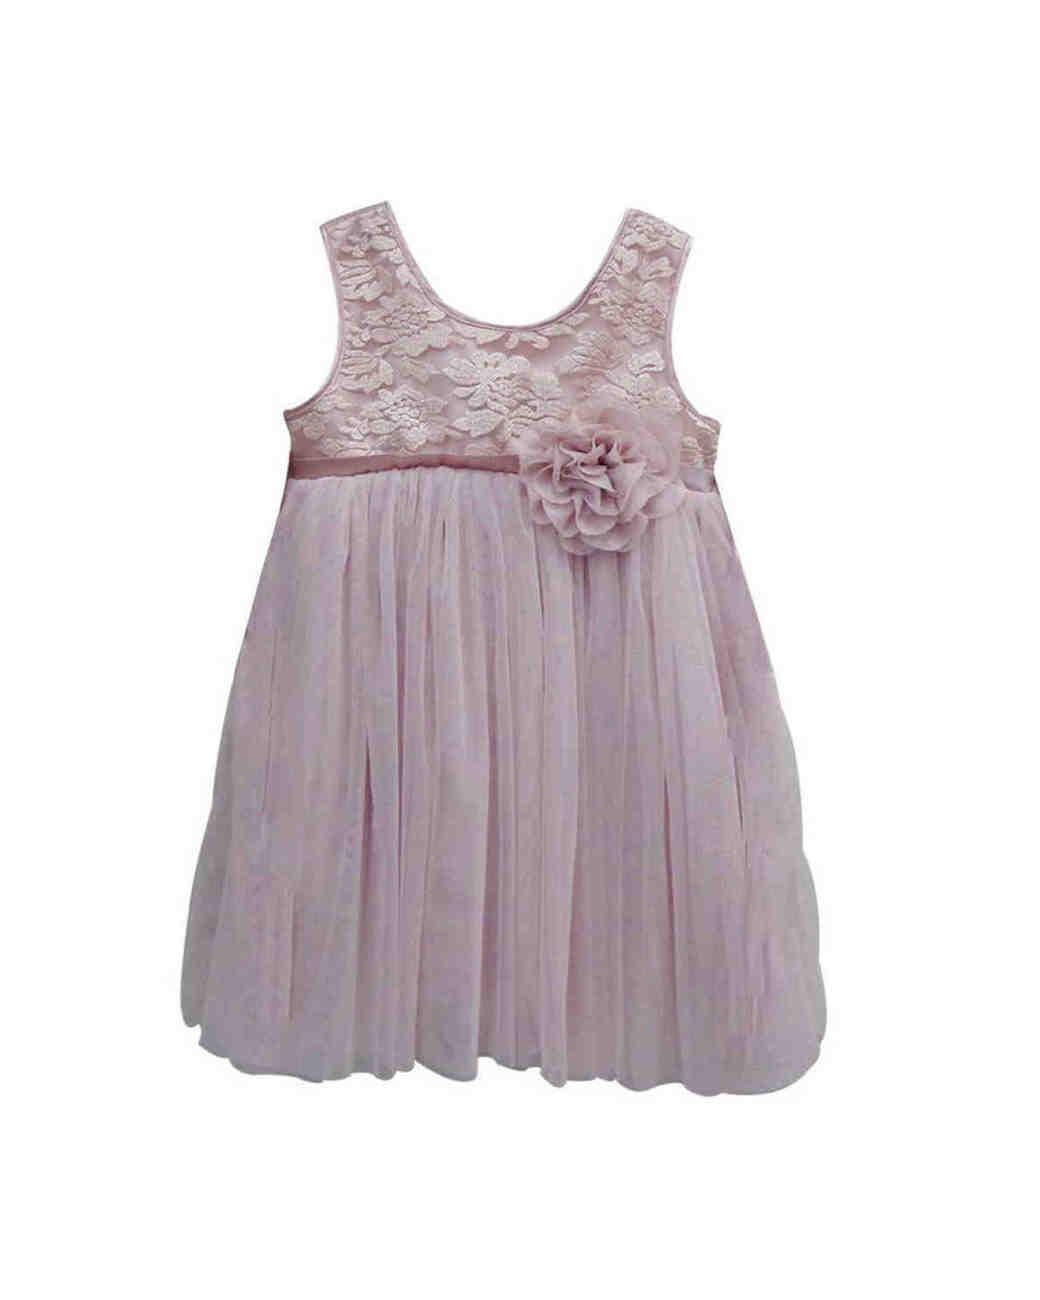 fb60083b4f The Sweetest Lace Flower Girl Dresses